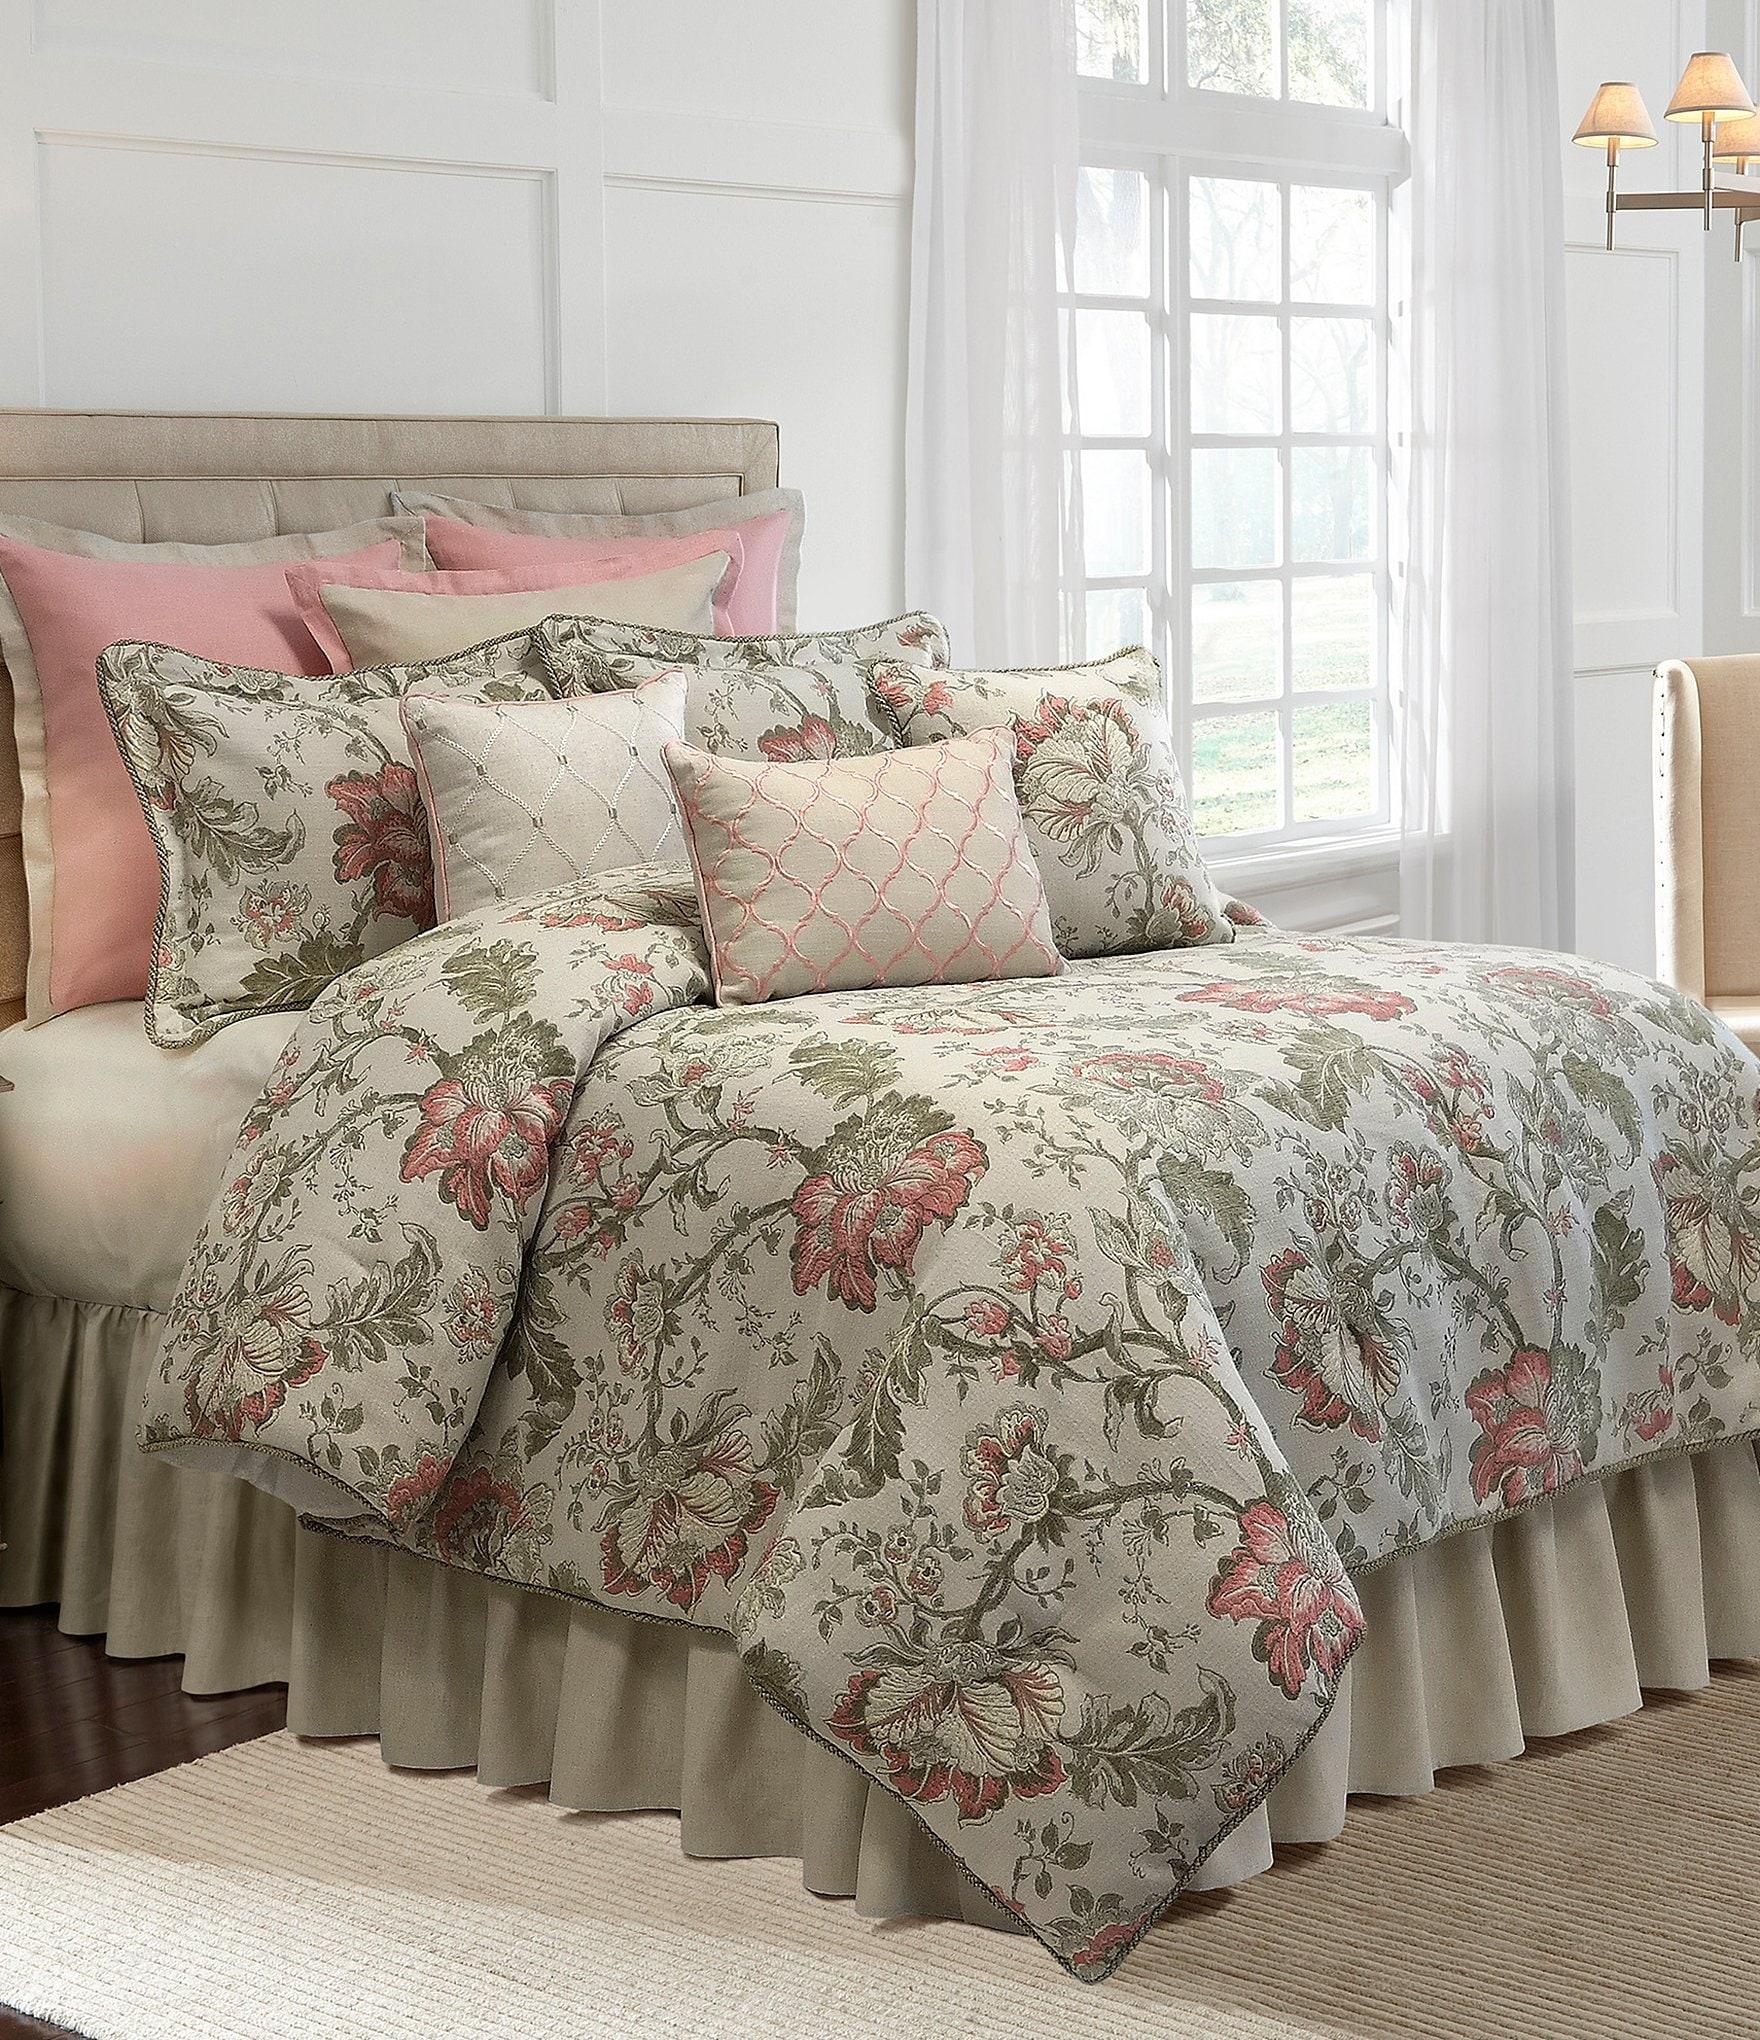 Veratex Rosario Floral Jacquard Comforter Set Dillards